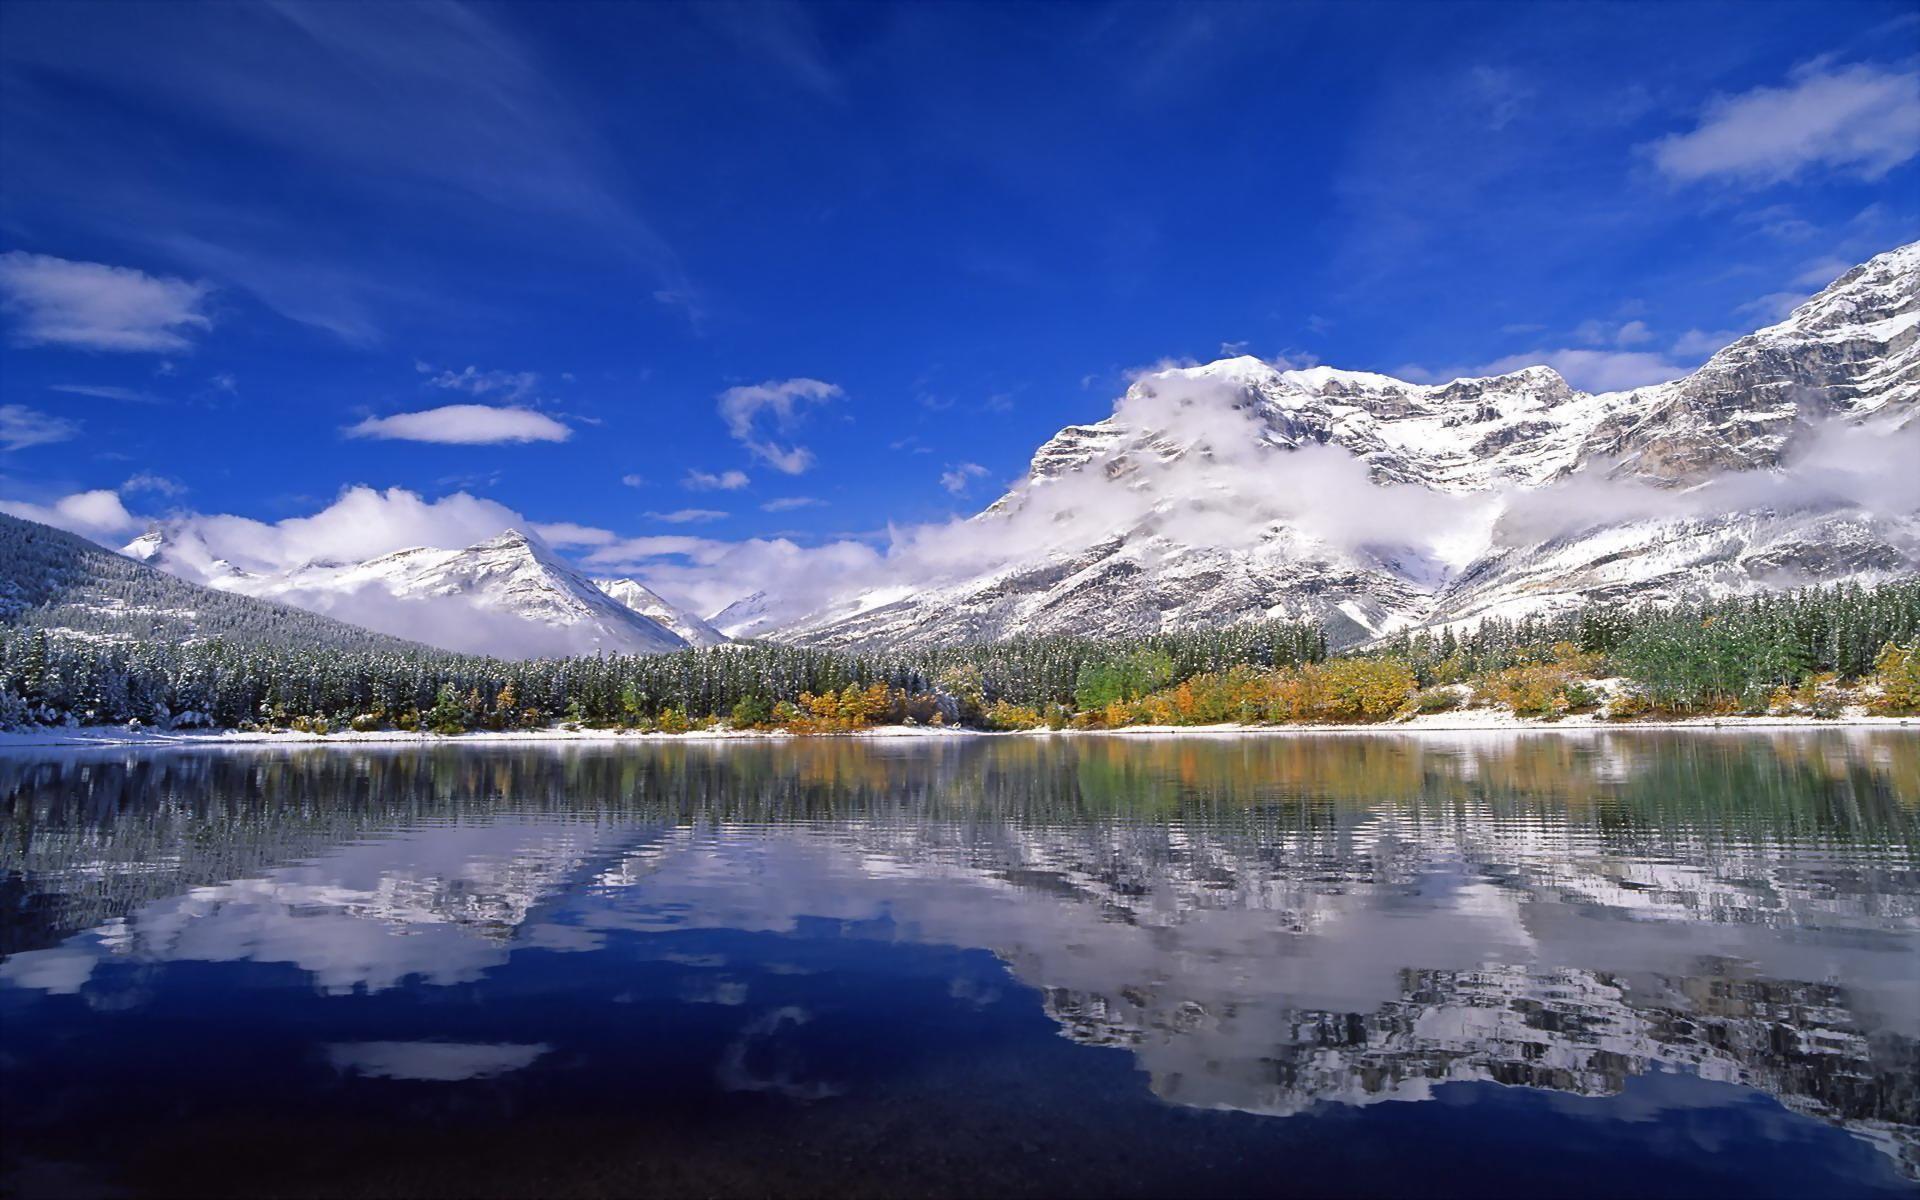 Wedge Pond, Alberta, Canada